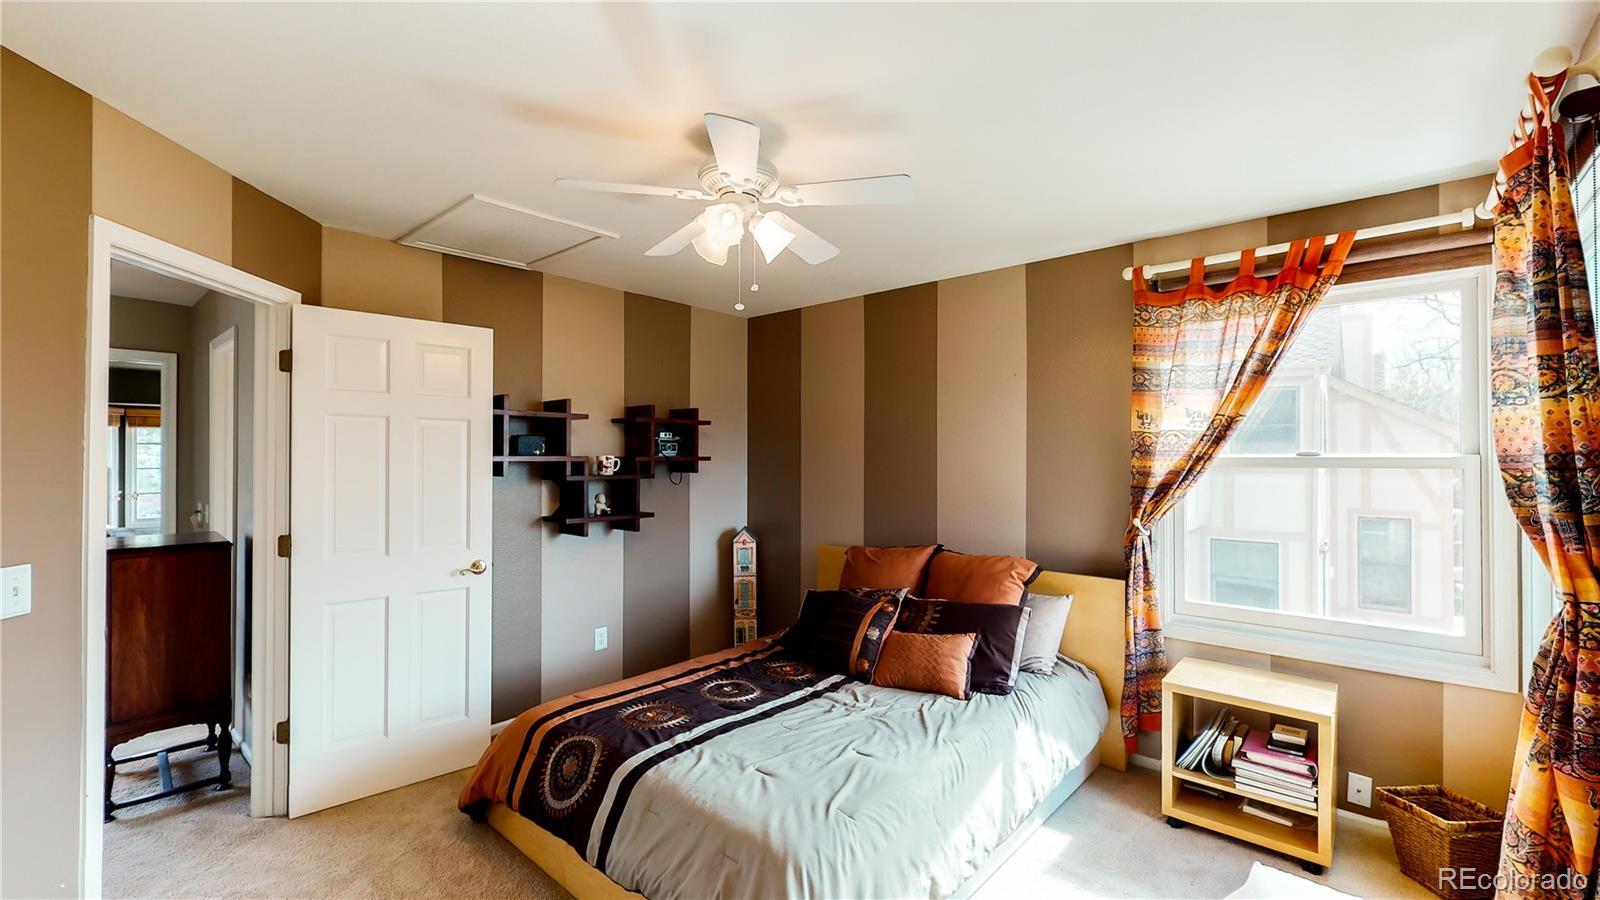 MLS# 9424893 - 24 - 2174 Terrace Drive, Highlands Ranch, CO 80126